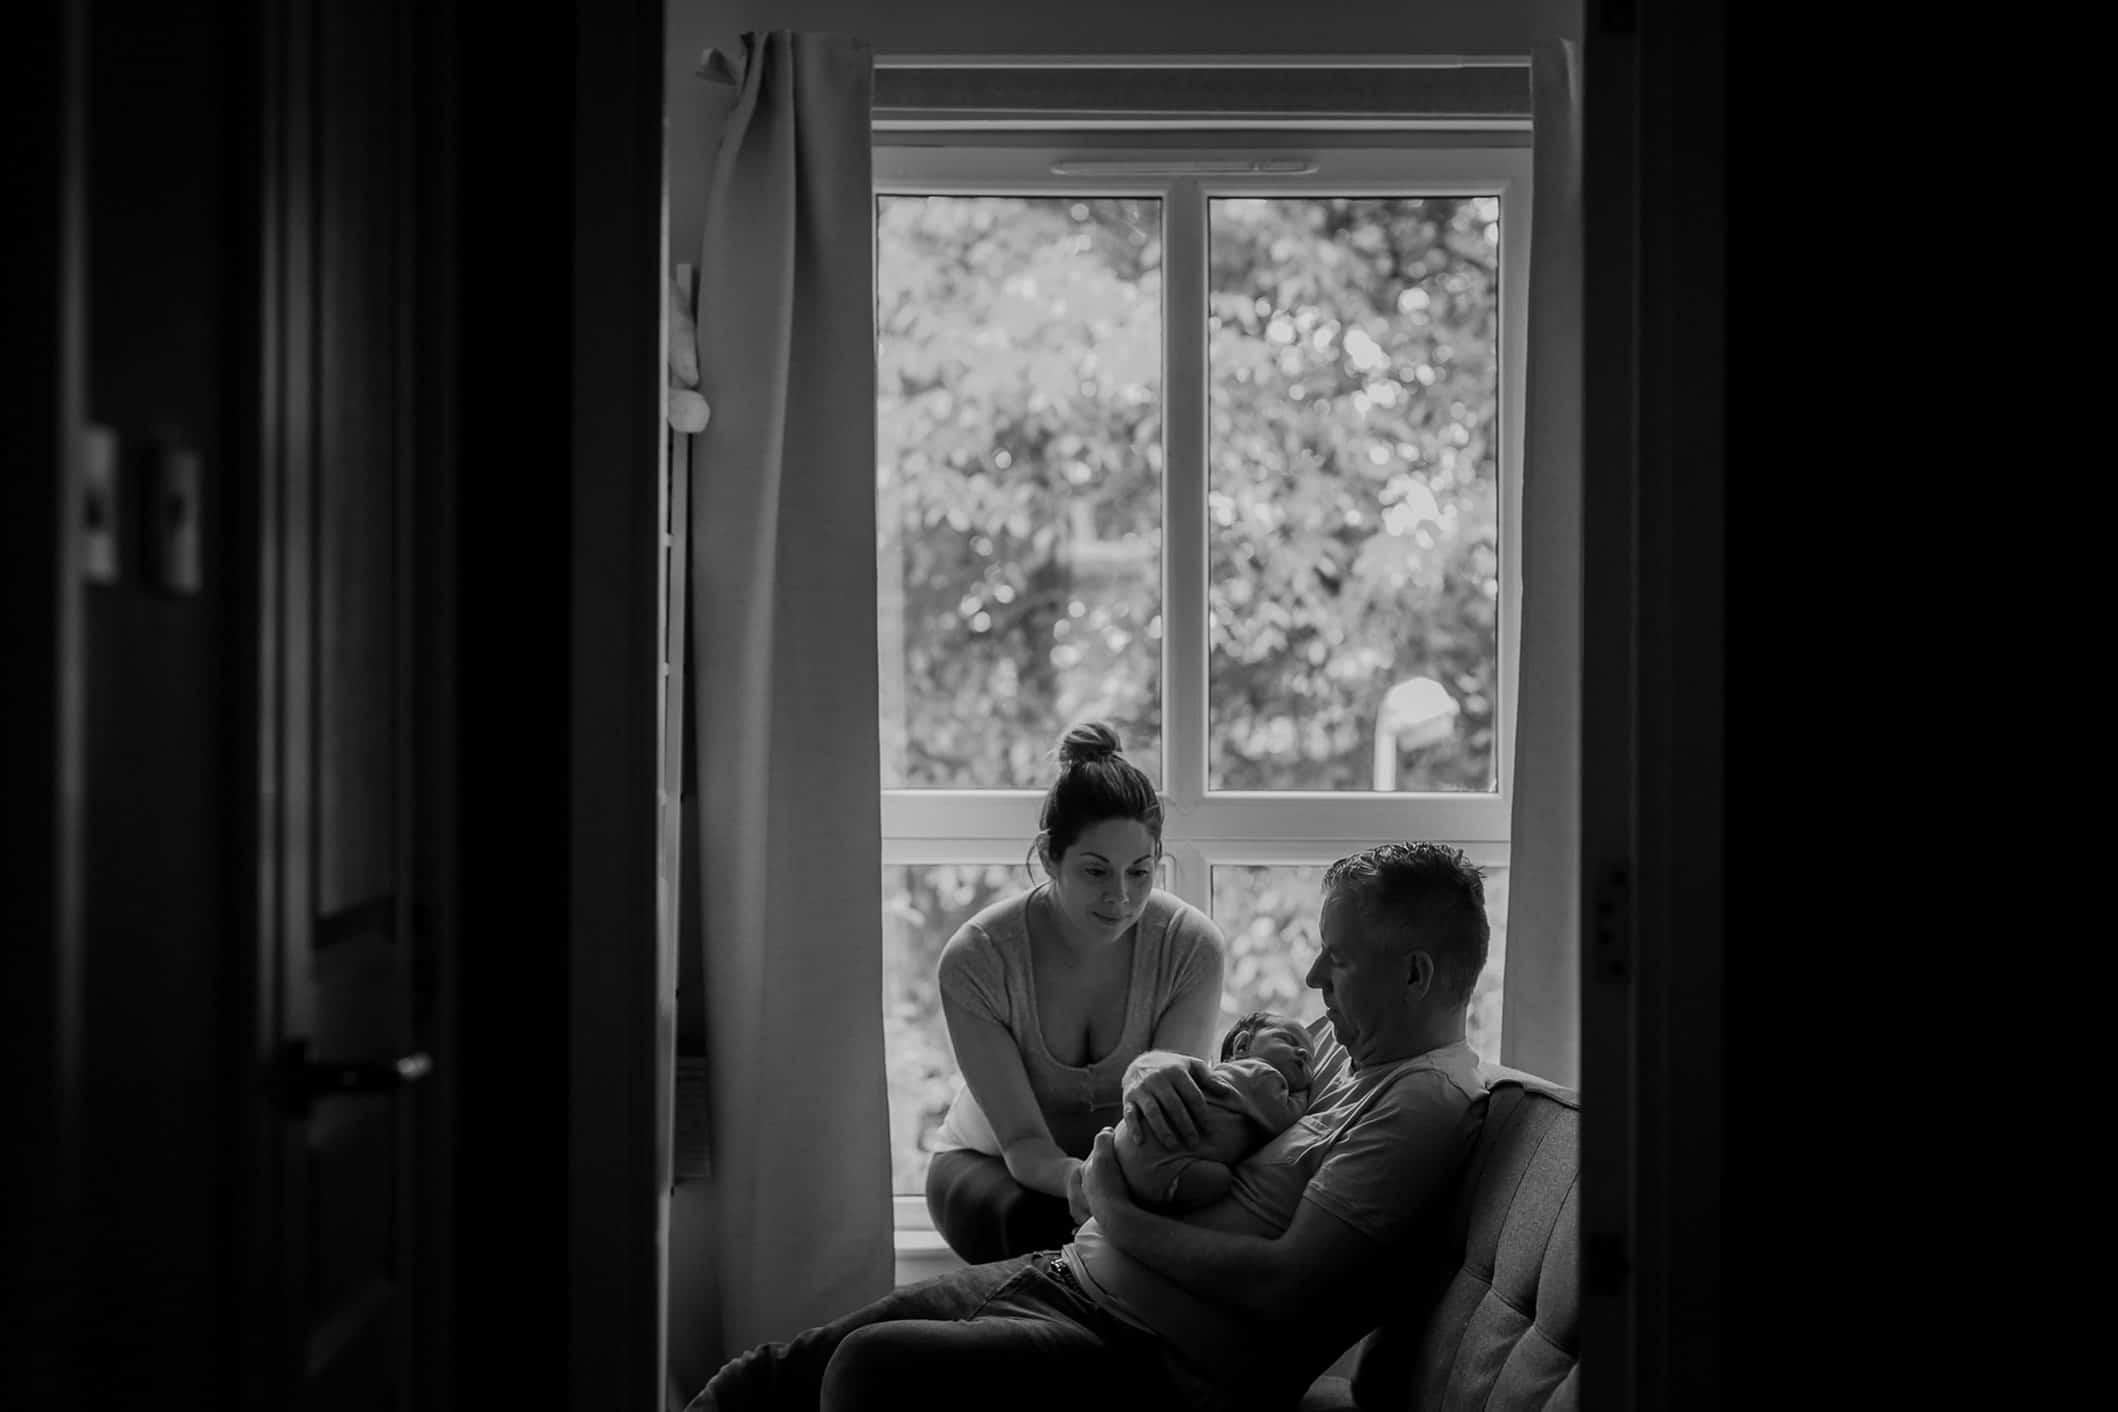 Newborn Photoshoots at home. Edinburgh and surrounding areas. 70